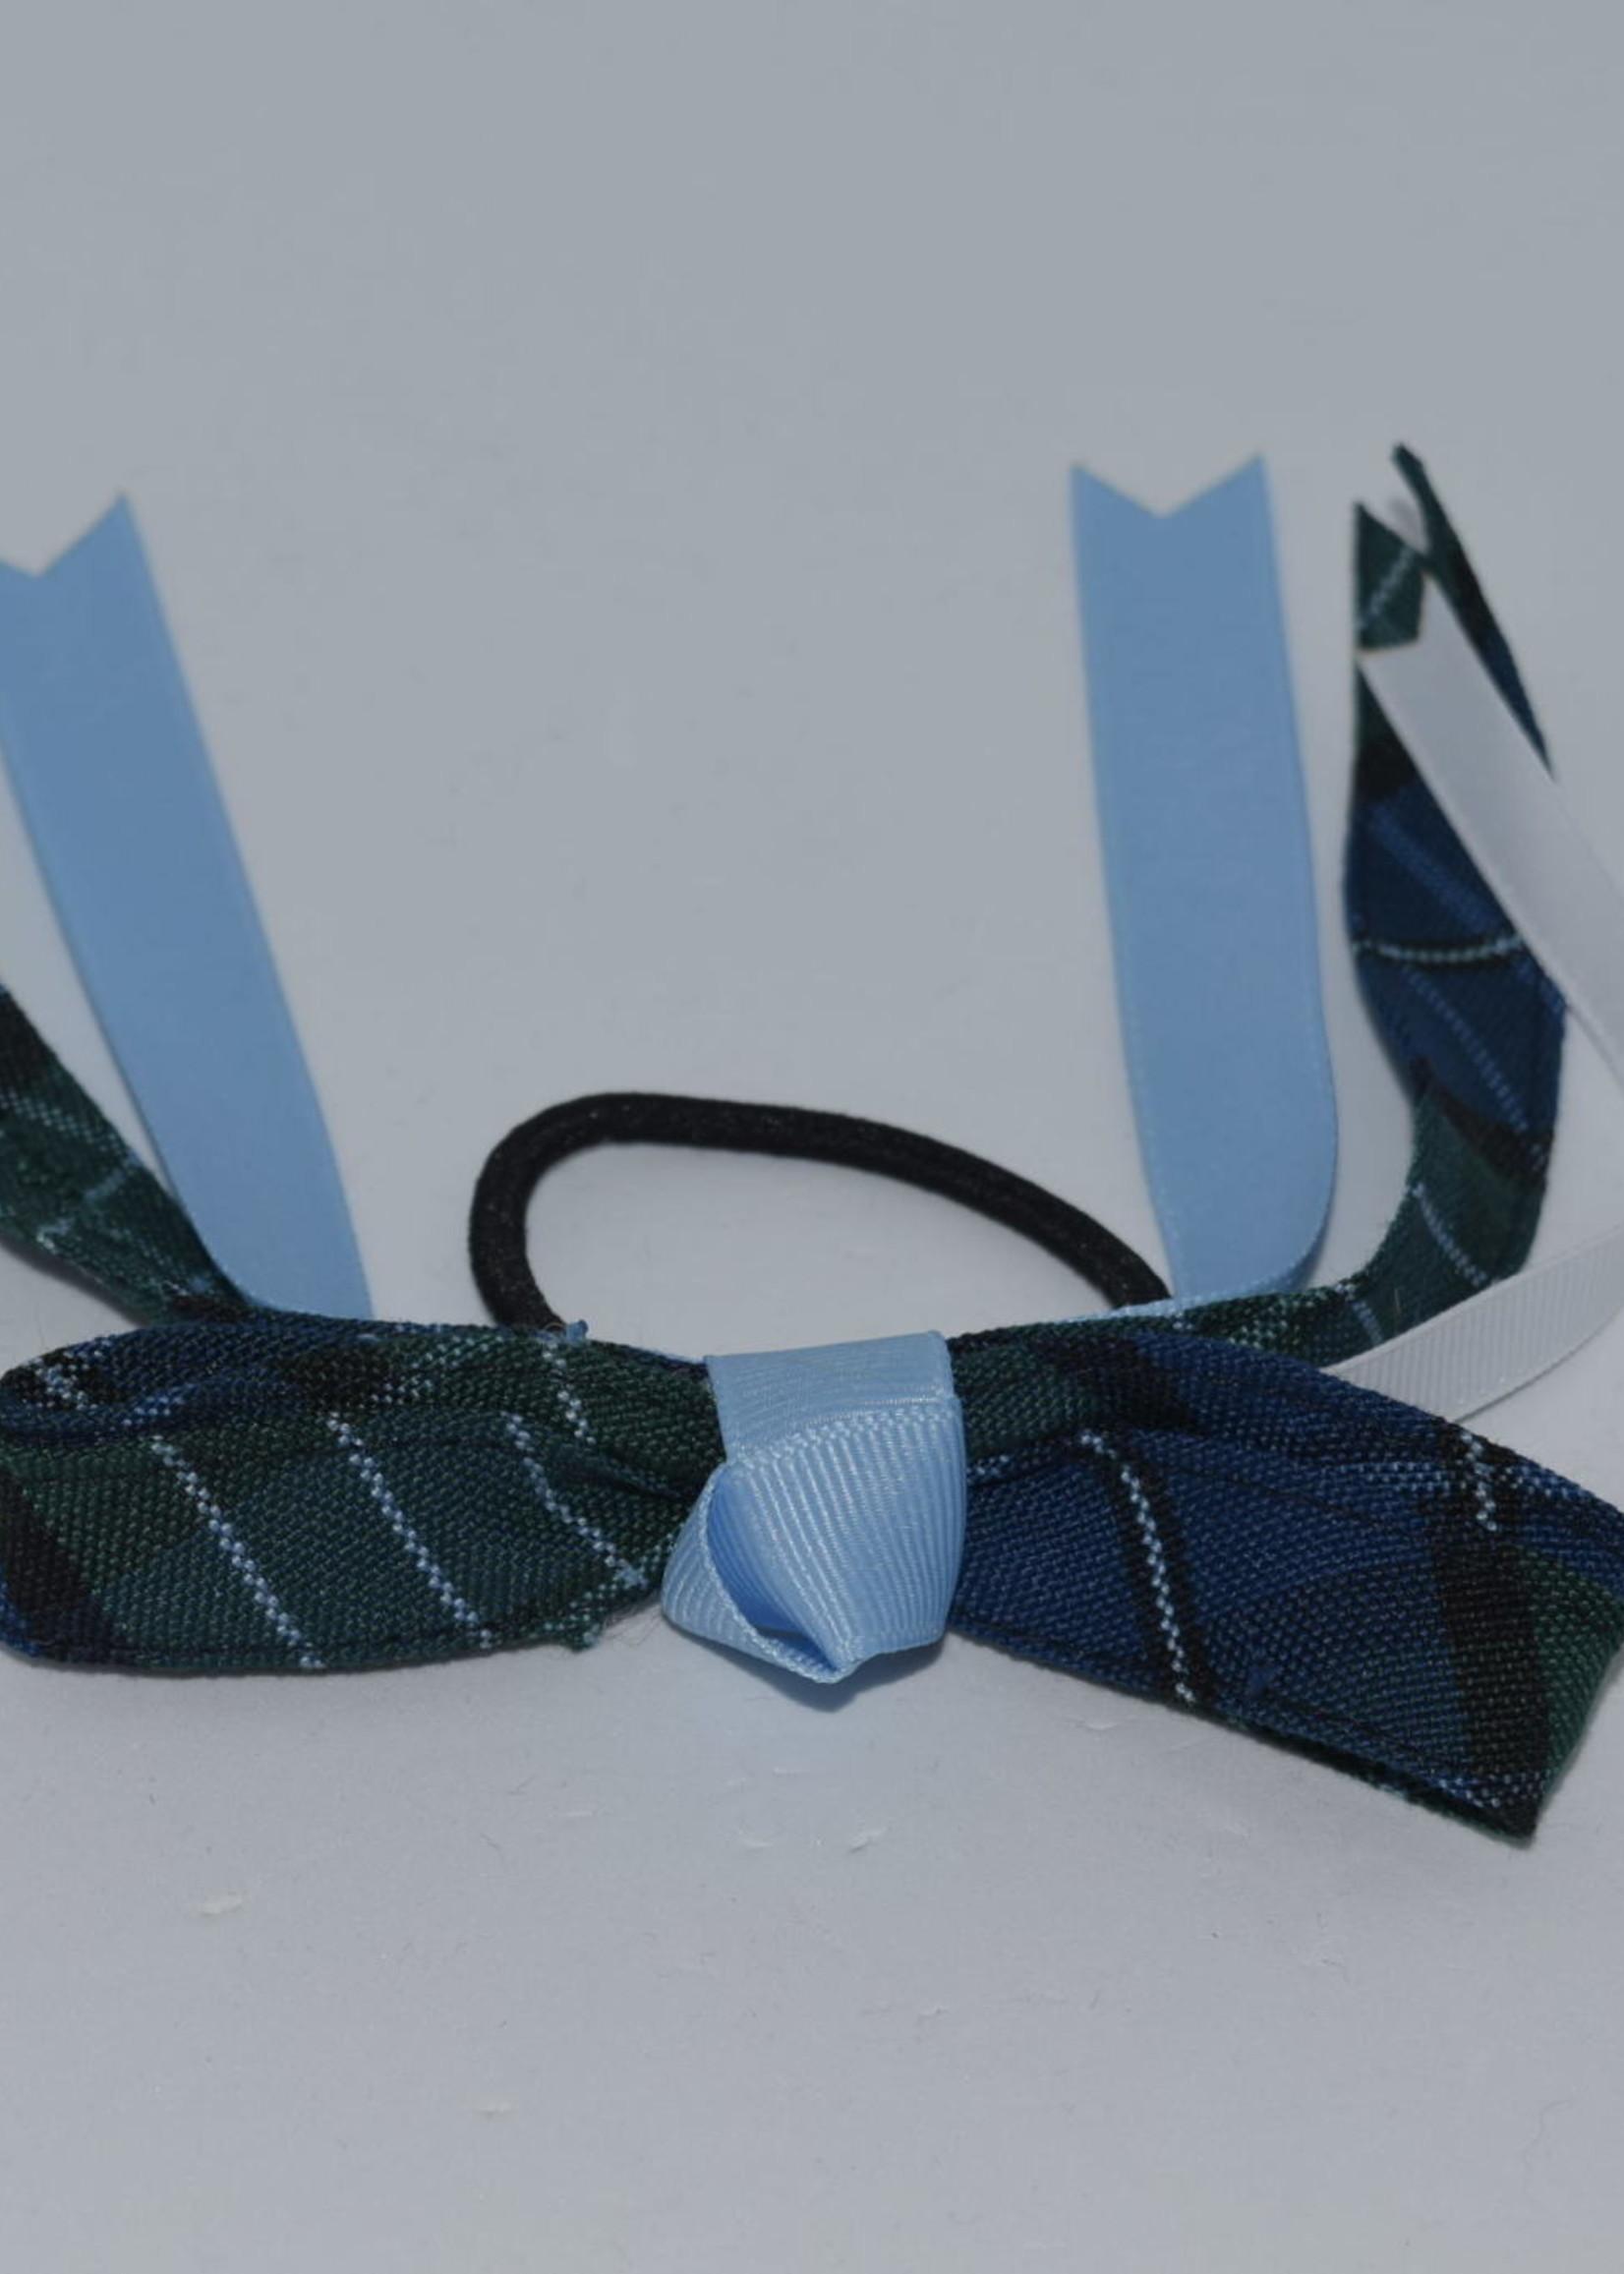 4 looped plaid bow w/plaid & grosgrain tails P96 LBL WHT